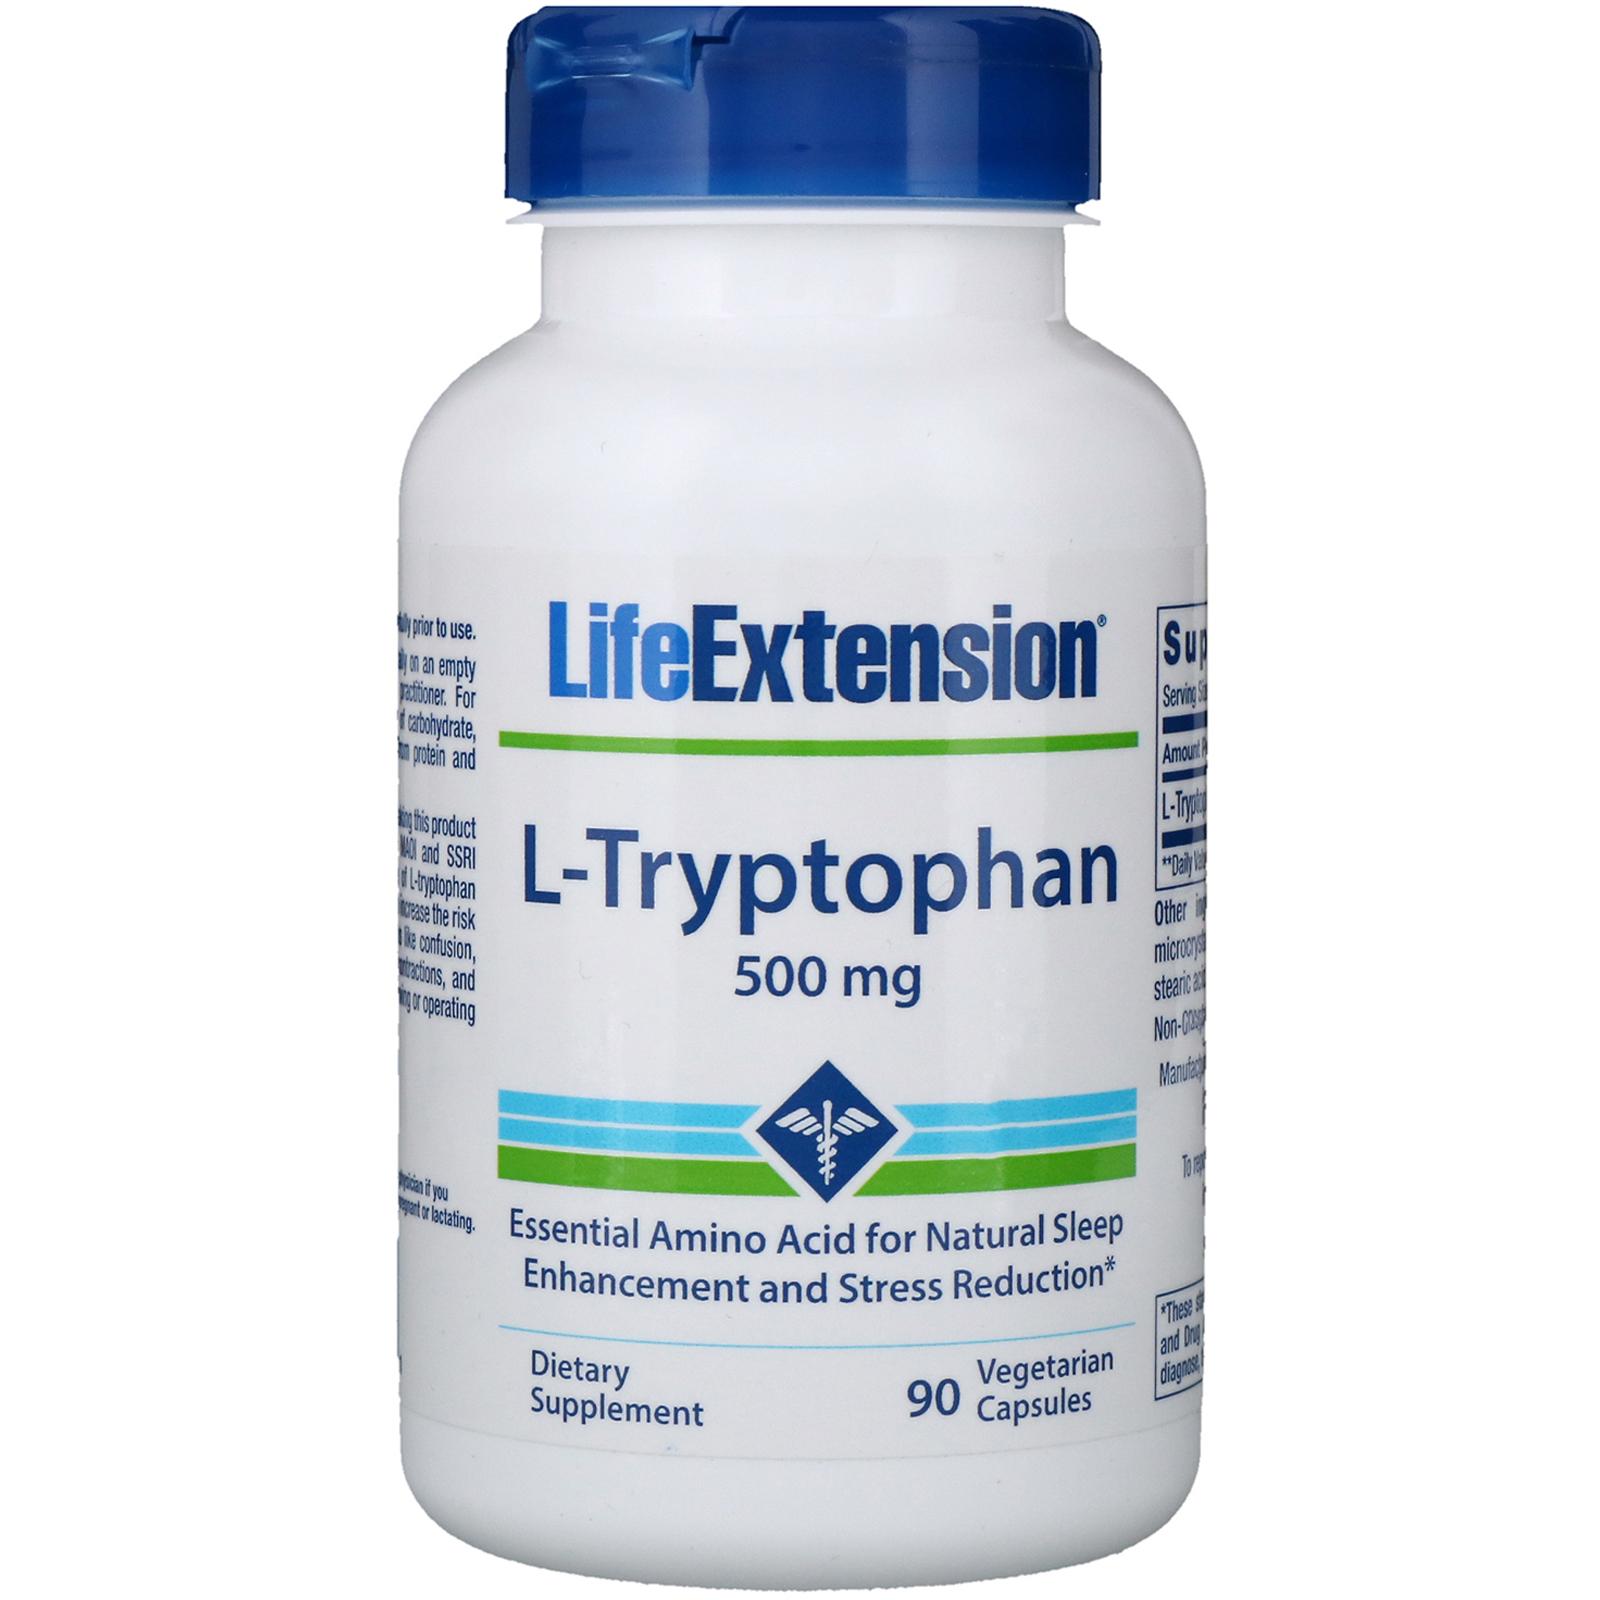 Tryptophan Benefits Sleep, Mood & More - Dr. Axe